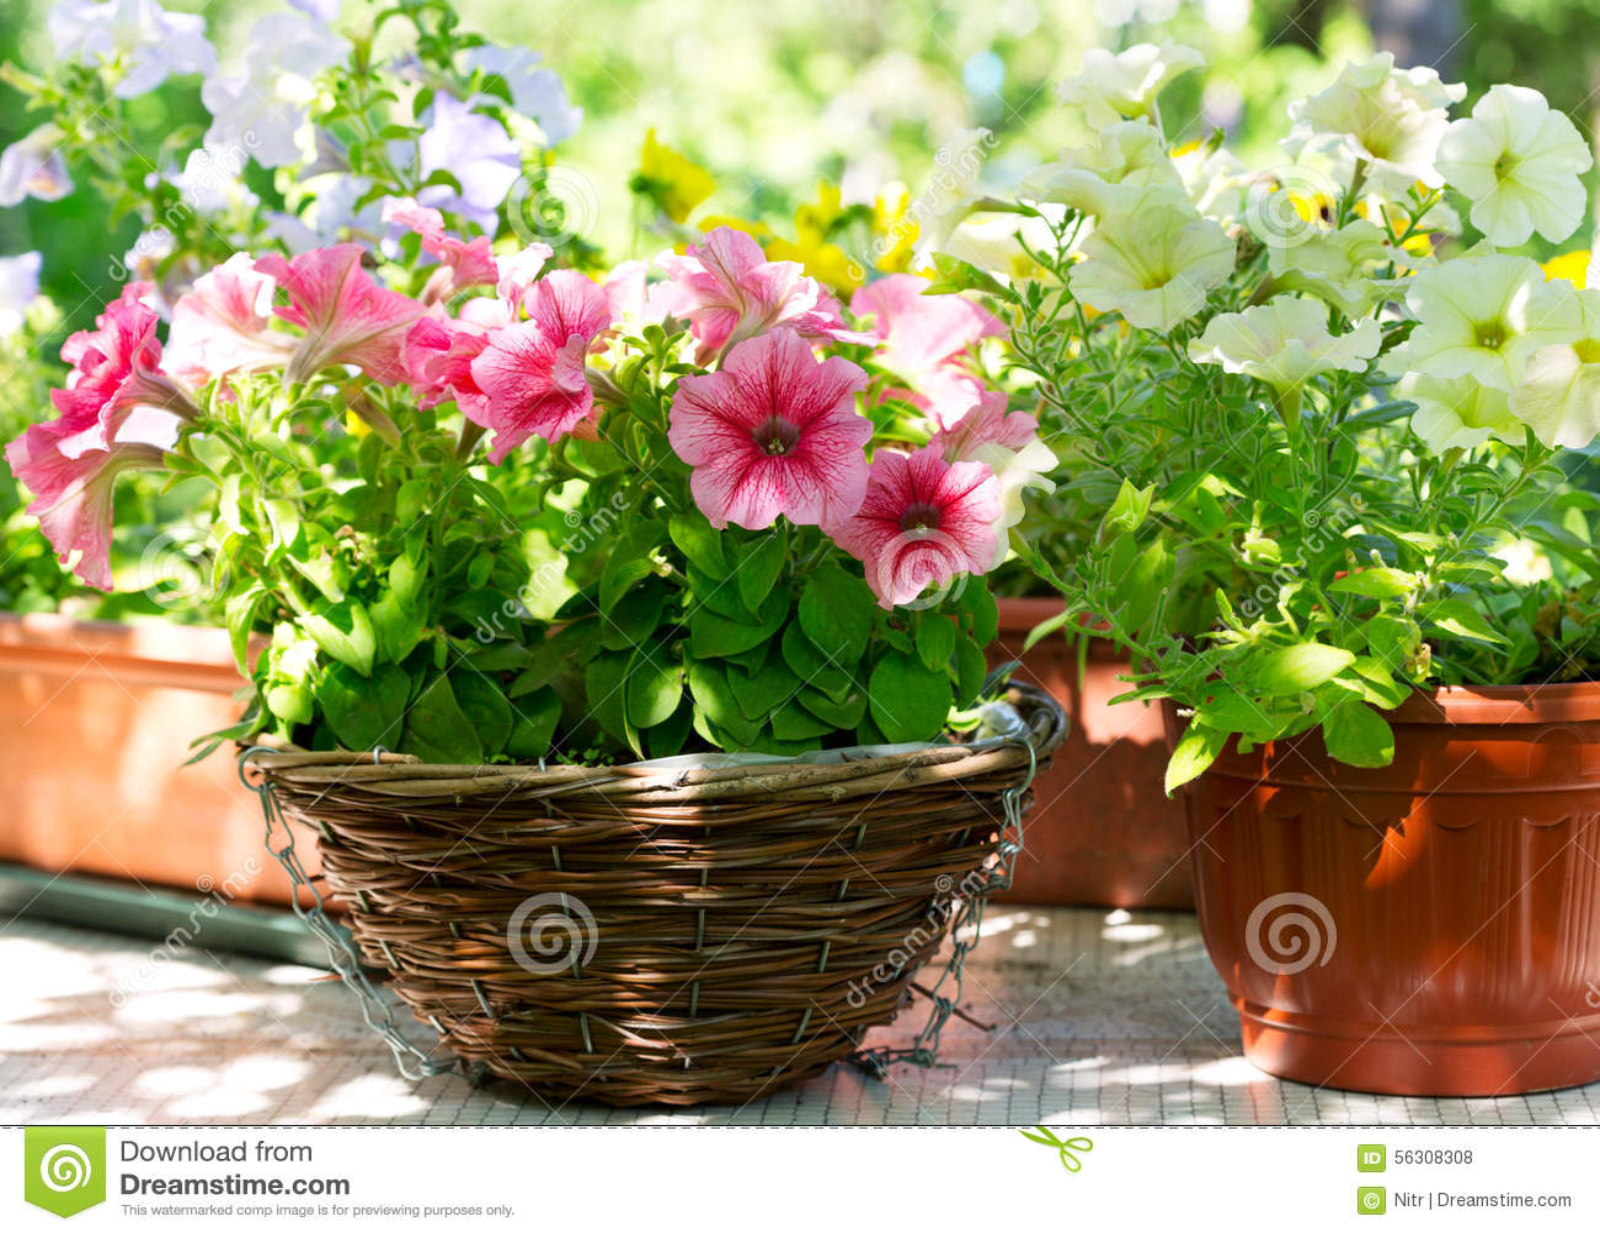 Vari fiori della petunia